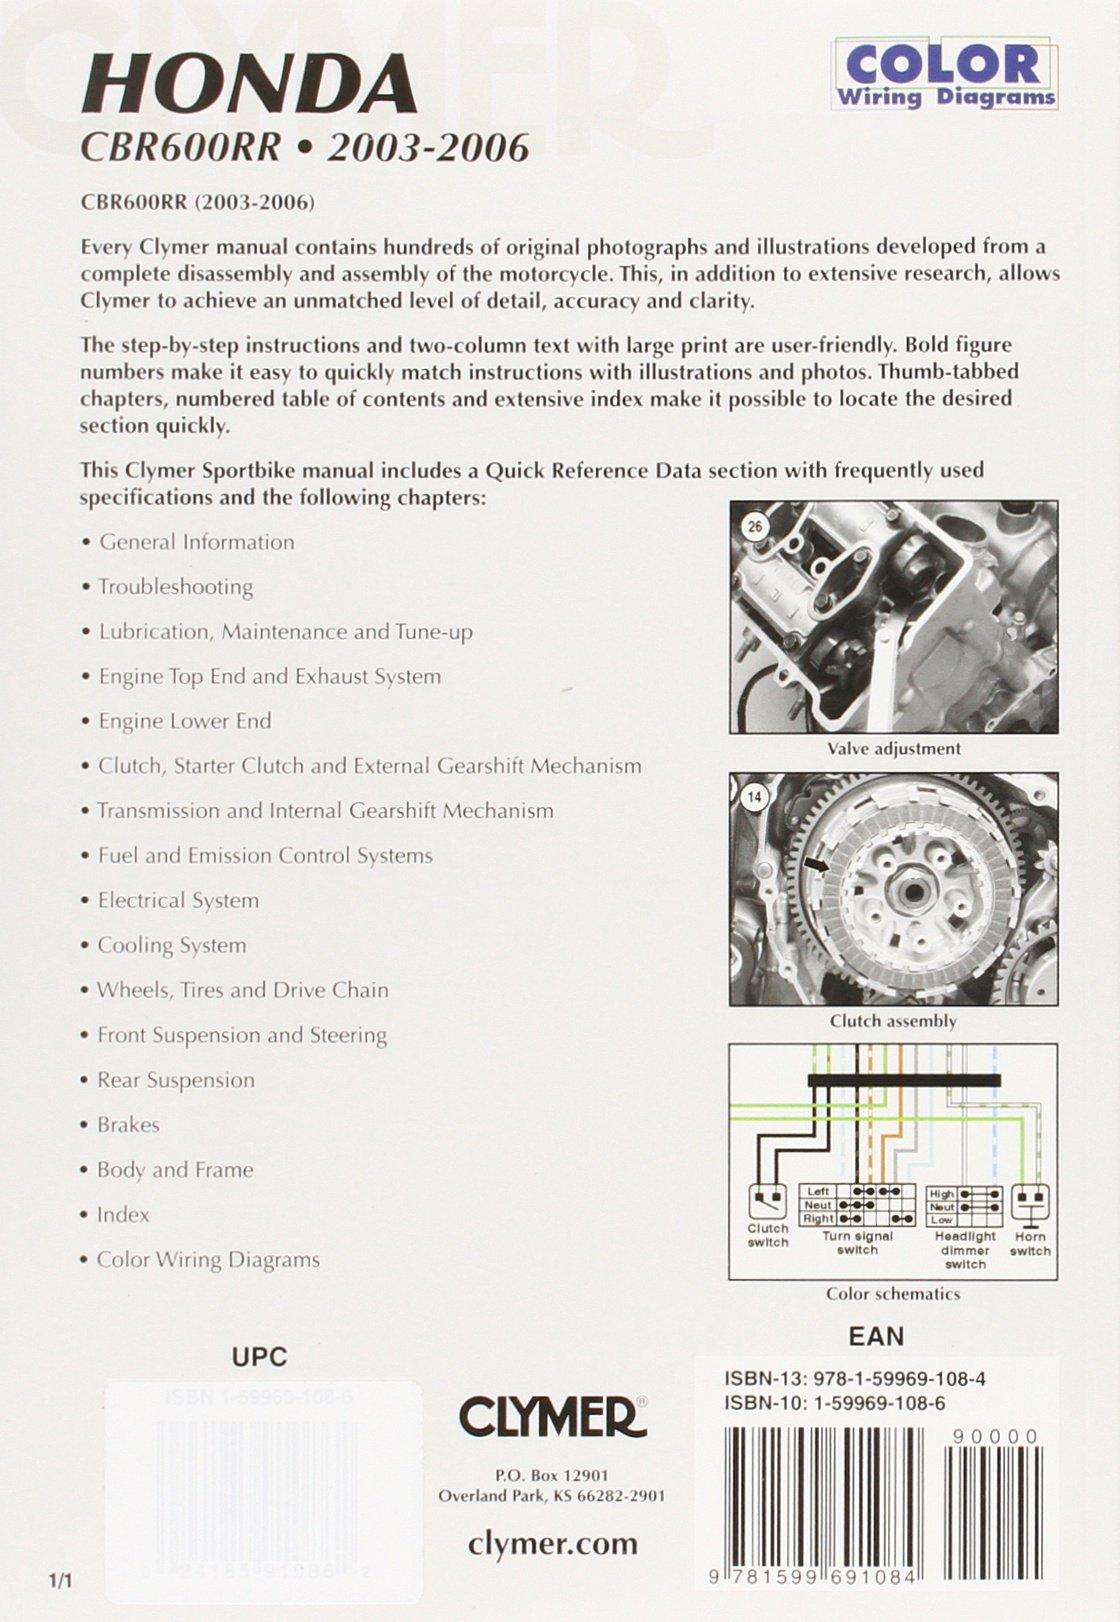 06 Cbr 600rr Wiring Diagram | Wiring Liry Honda Cbr Rr Wiring Diagram on z1000 wiring diagram, vt1100c2 wiring diagram, vt750 wiring diagram, cbr250 wiring diagram, sabre wiring diagram, rebel wiring diagram, crf450r wiring diagram, cbr600f4i wiring diagram, crf230l wiring diagram, hayabusa wiring diagram, cb1100 wiring diagram, cbr929rr wiring diagram, xr250l wiring diagram, xr250r wiring diagram, nc700x wiring diagram, crf250r wiring diagram, cbr500r wiring diagram, crf250x wiring diagram, vt1100 wiring diagram, honda wiring diagram,